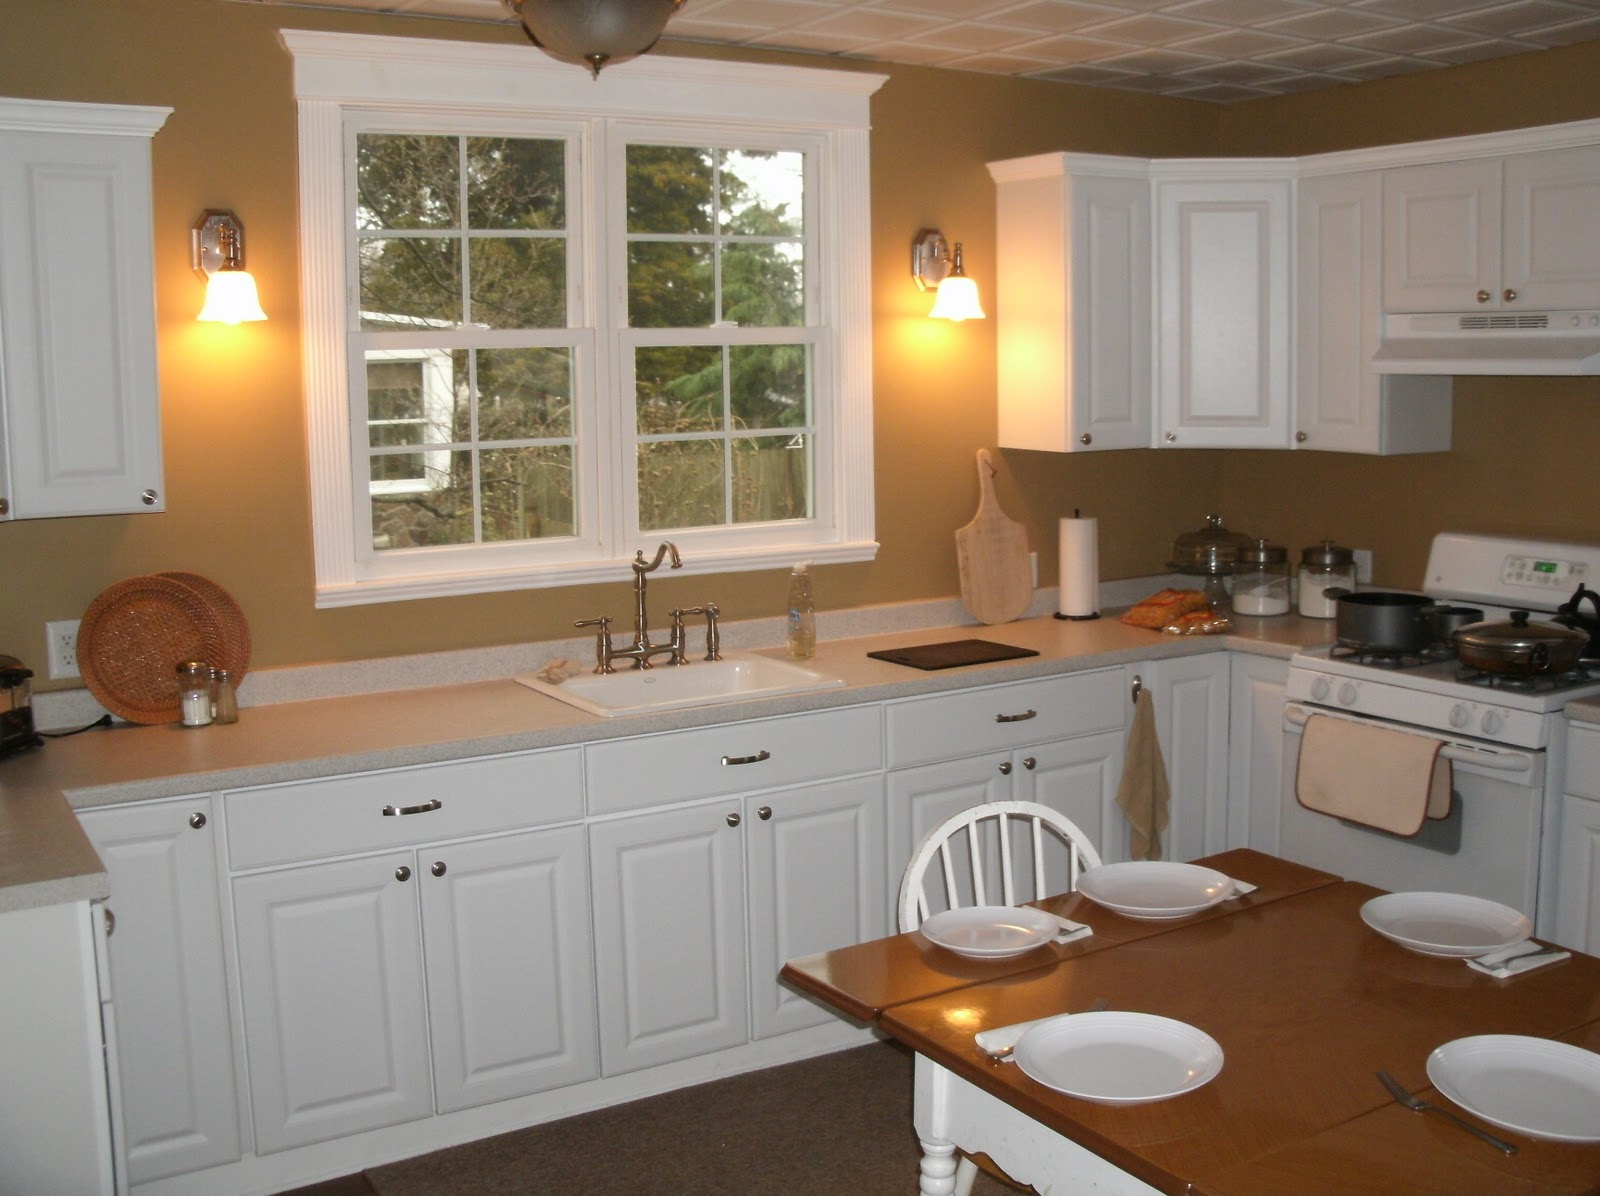 Small kitchen renovation cost - large